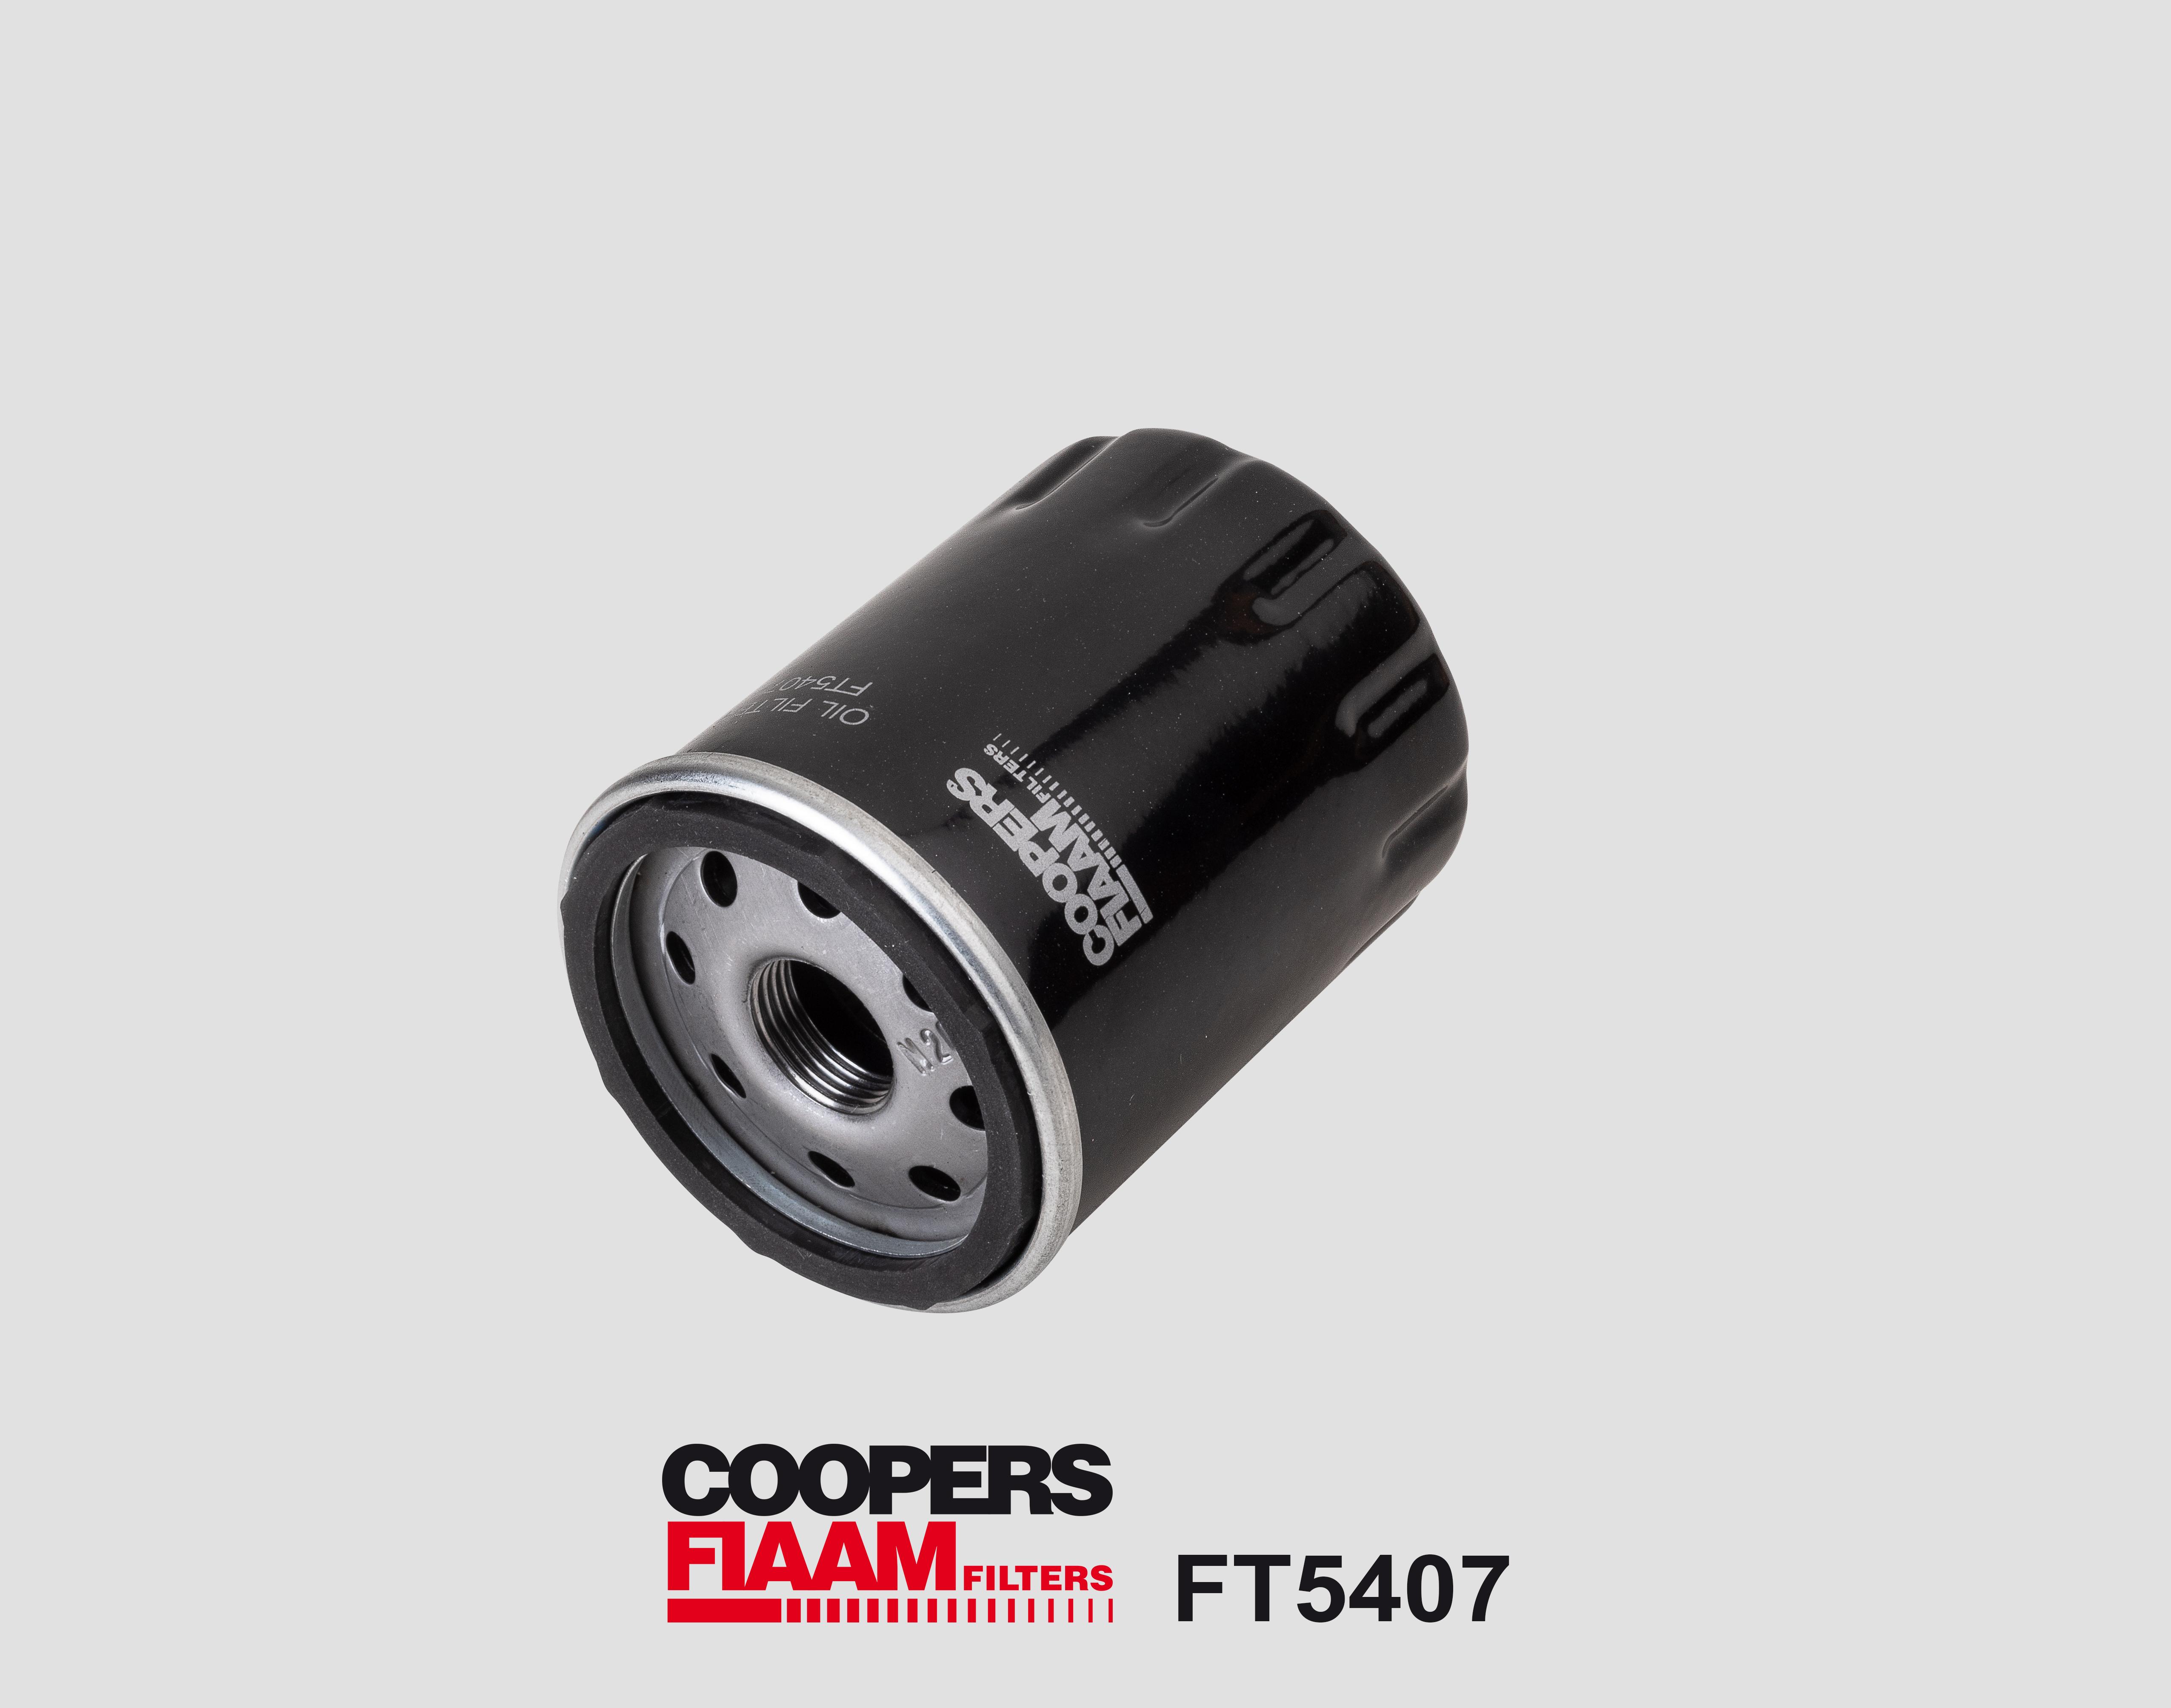 Coopersfiaam Filters FT5207 Filtro Motore